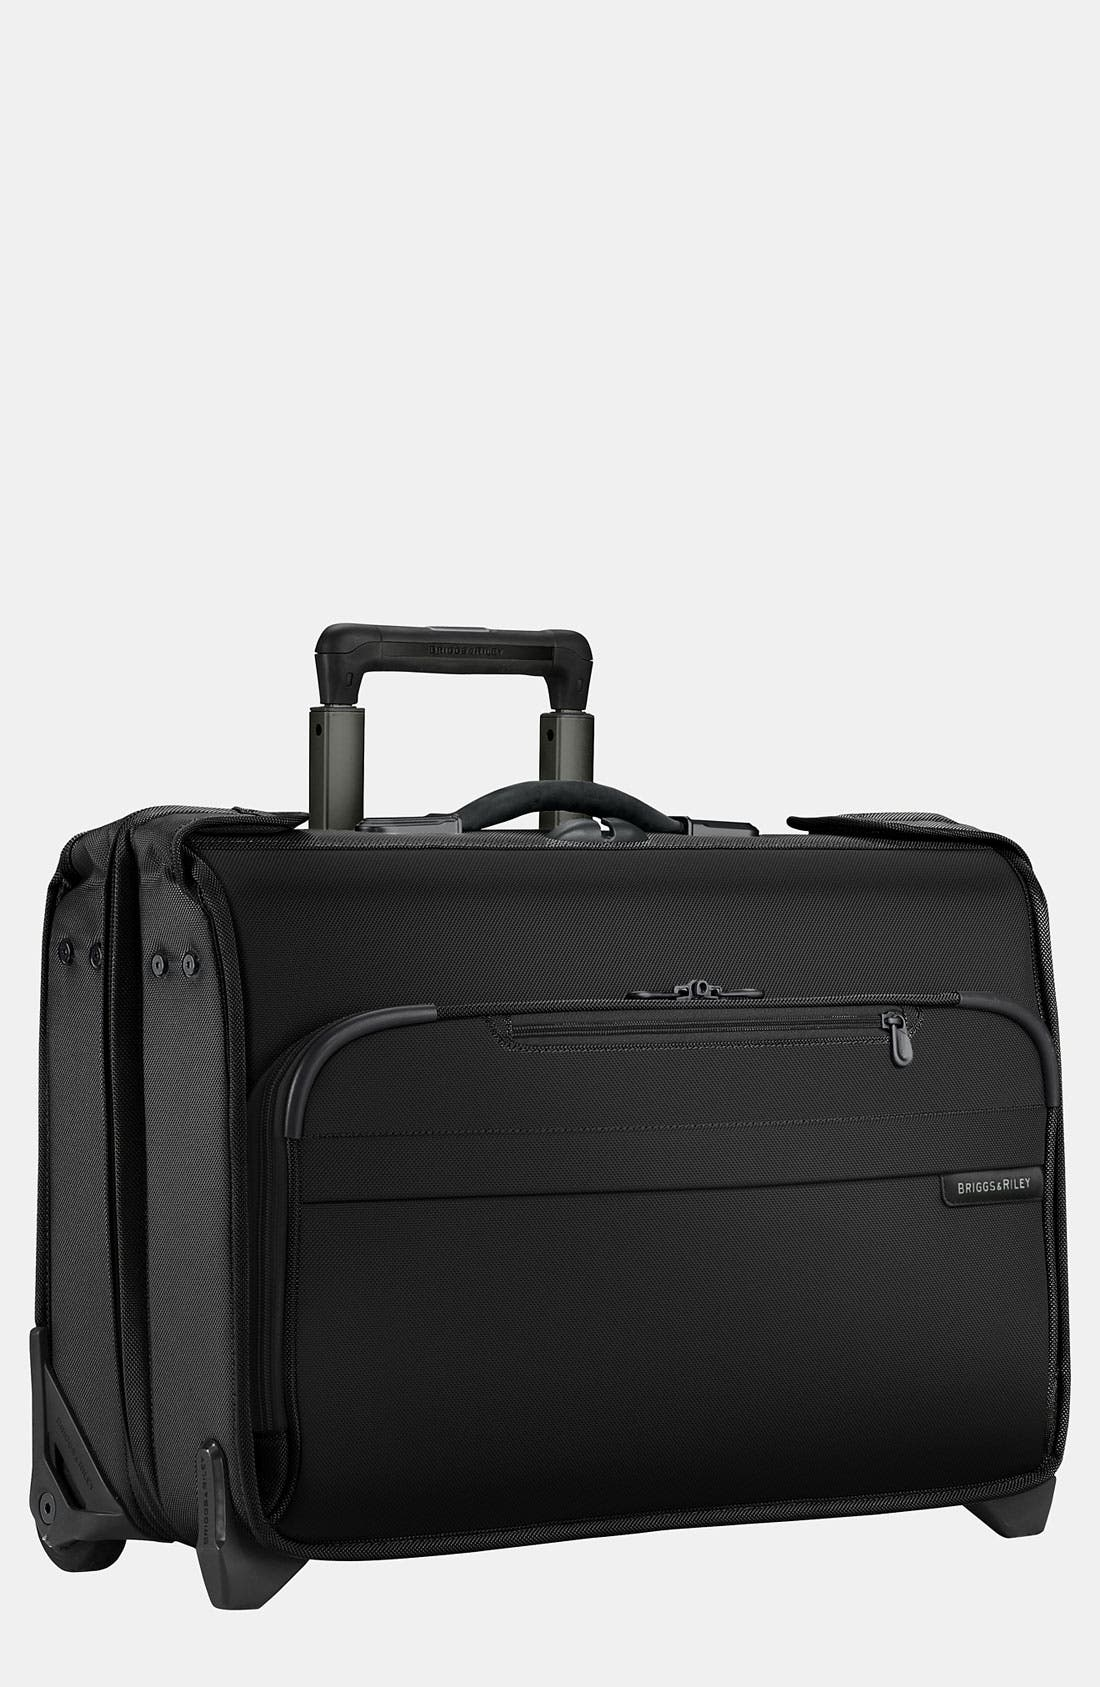 BRIGGS & RILEY Baseline Rolling Carry-On Garment Bag